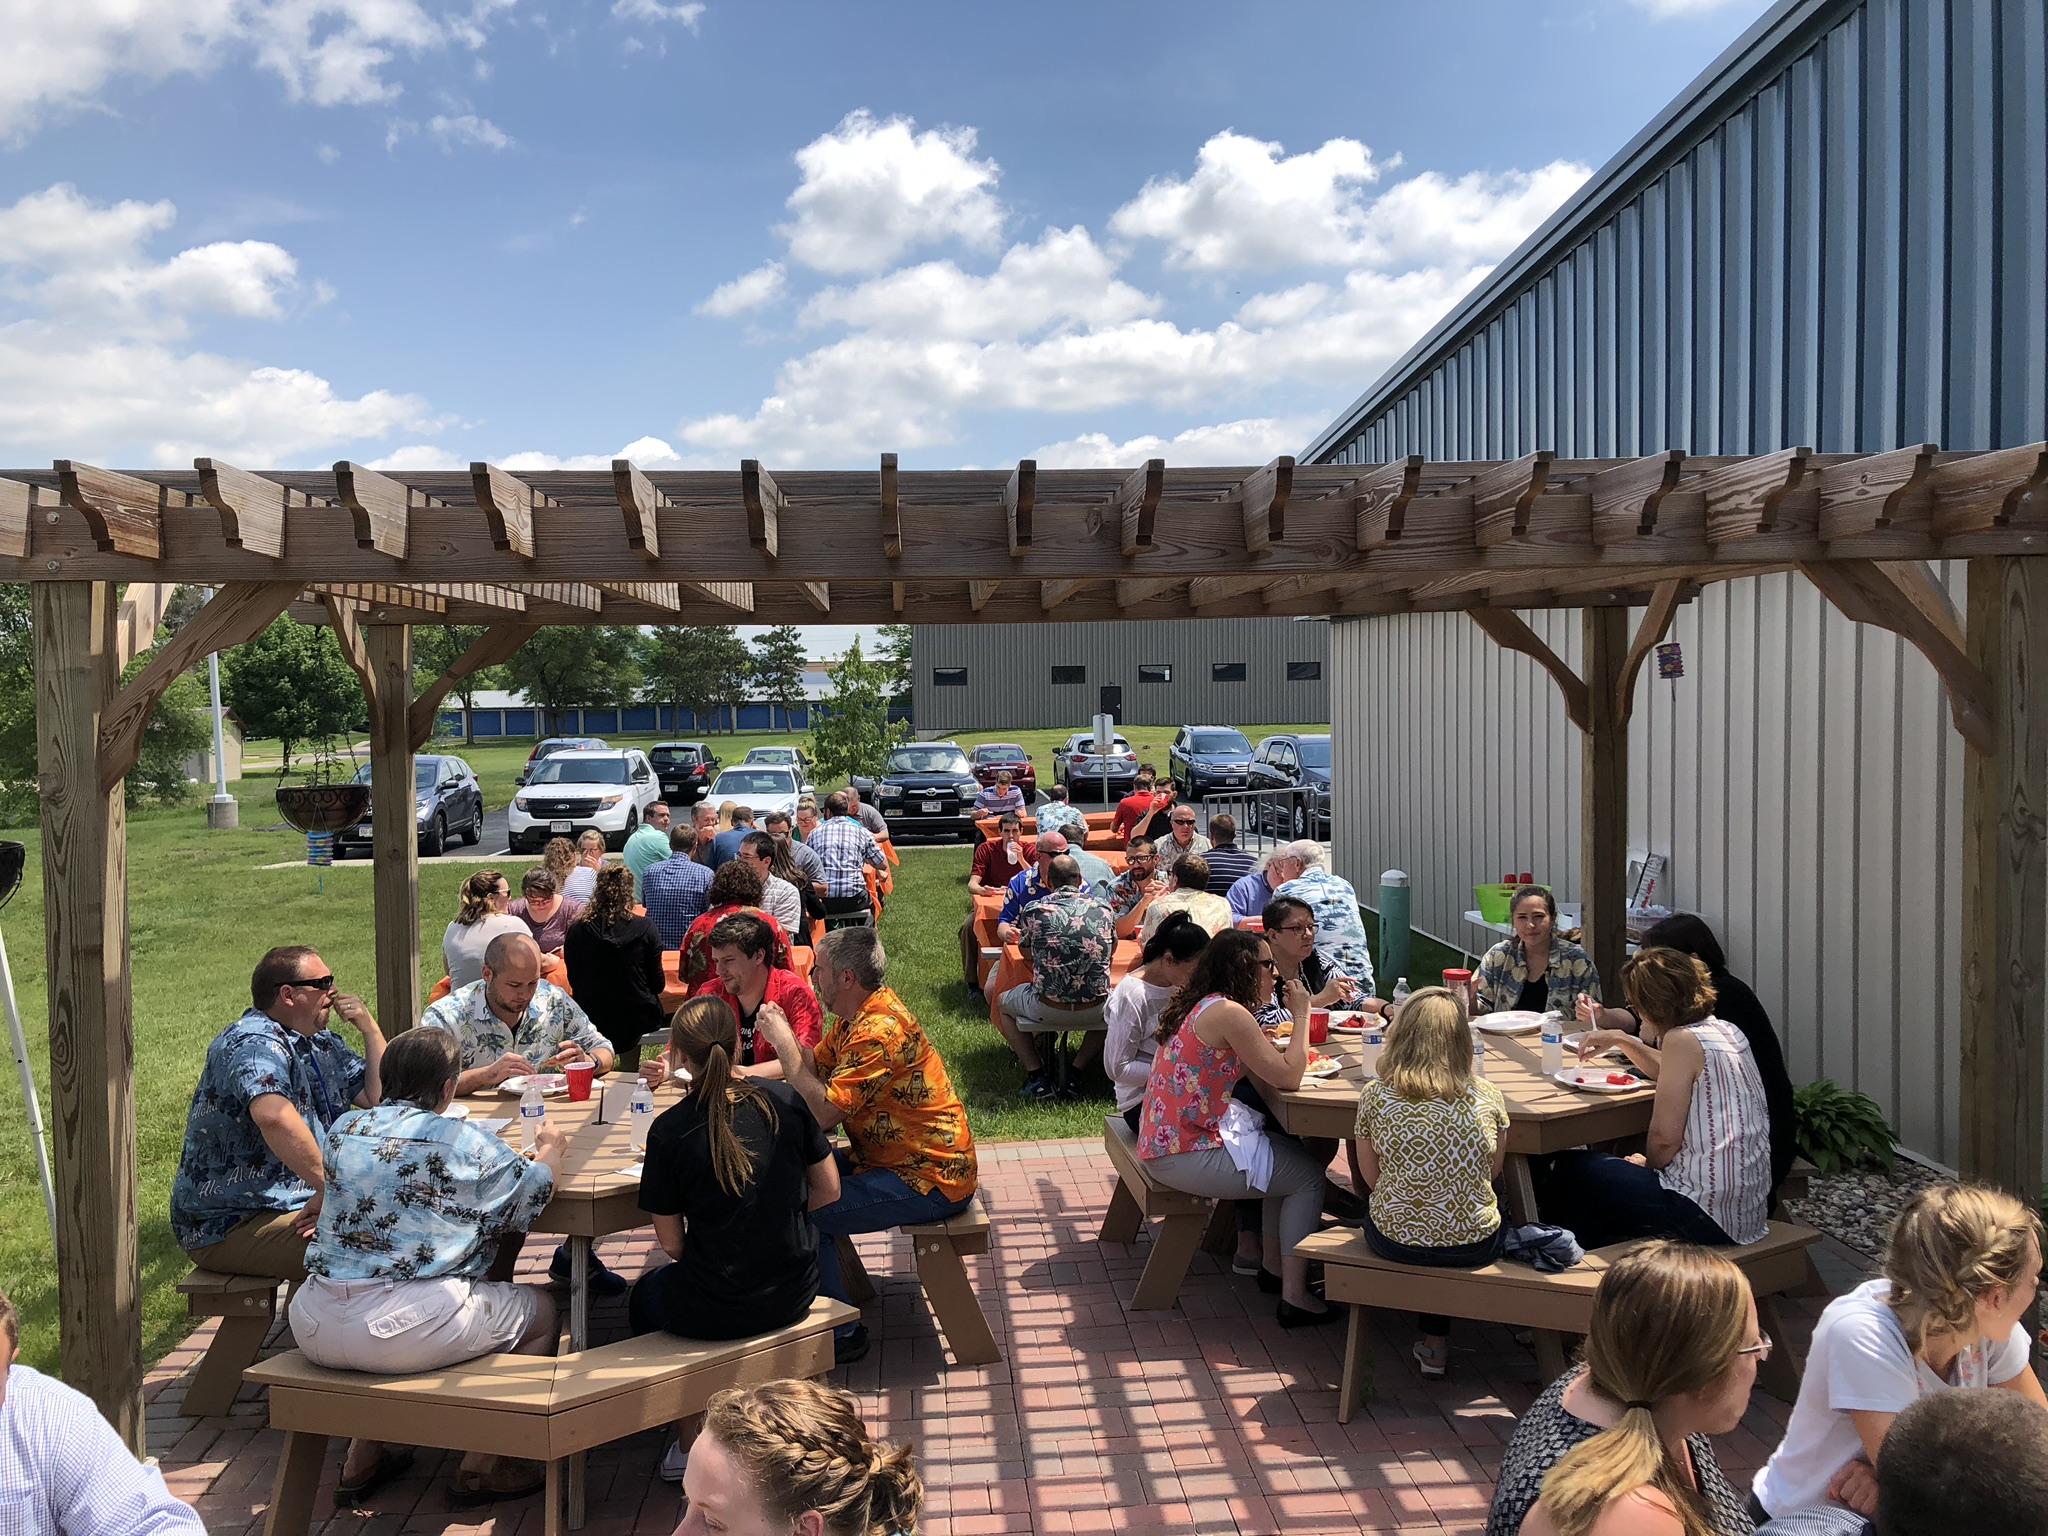 Sauk City employees enjoying the company picnic outside on the patio